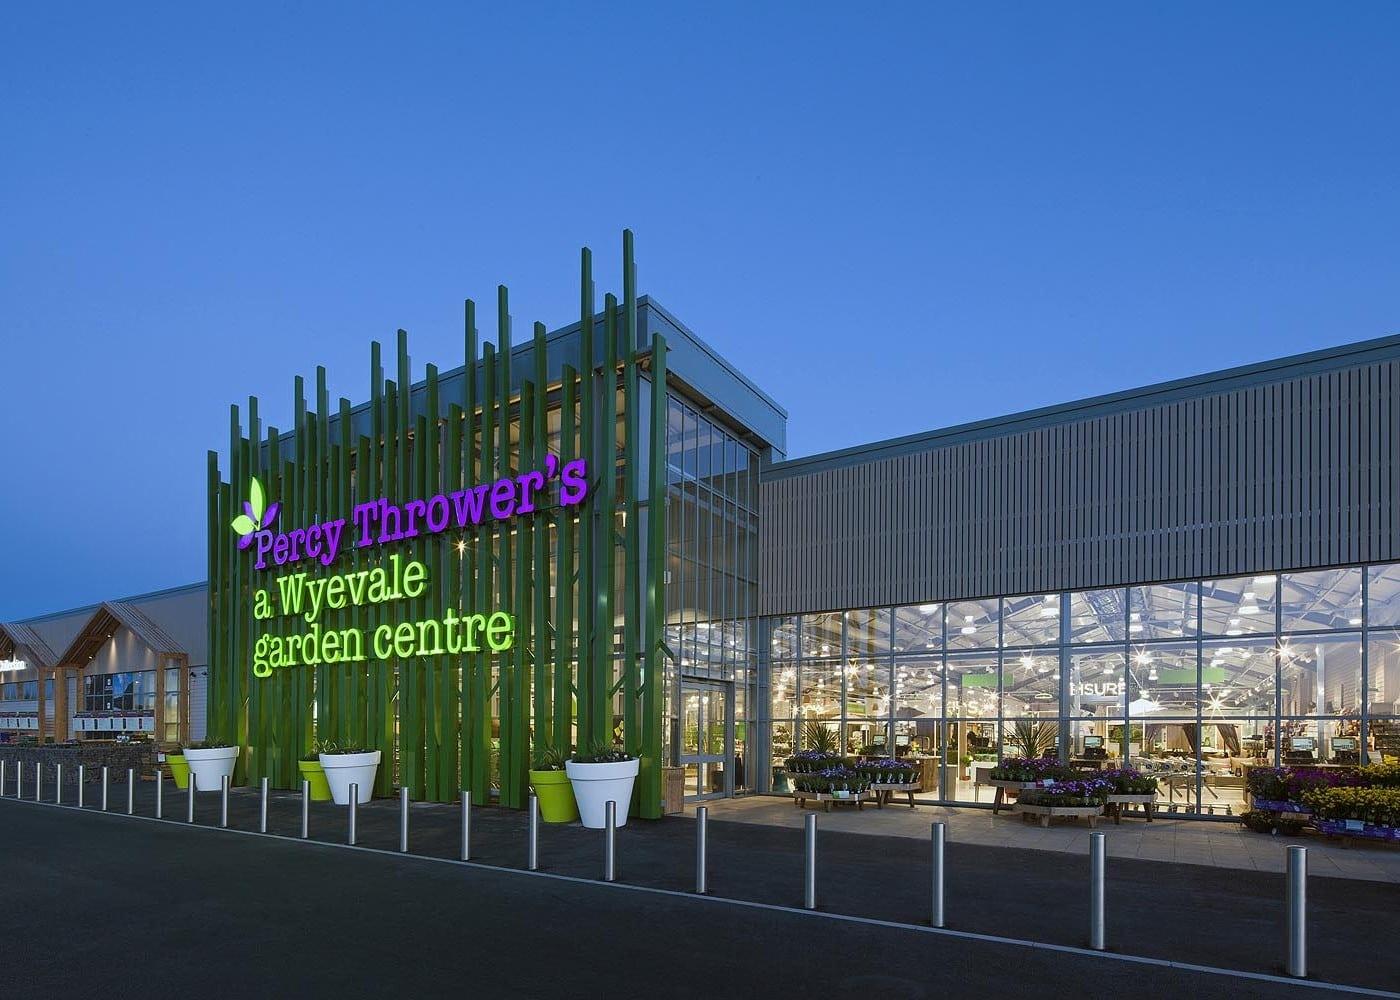 retail lighting design: Percy Thrower's a Wyevale Garden Centre exterior